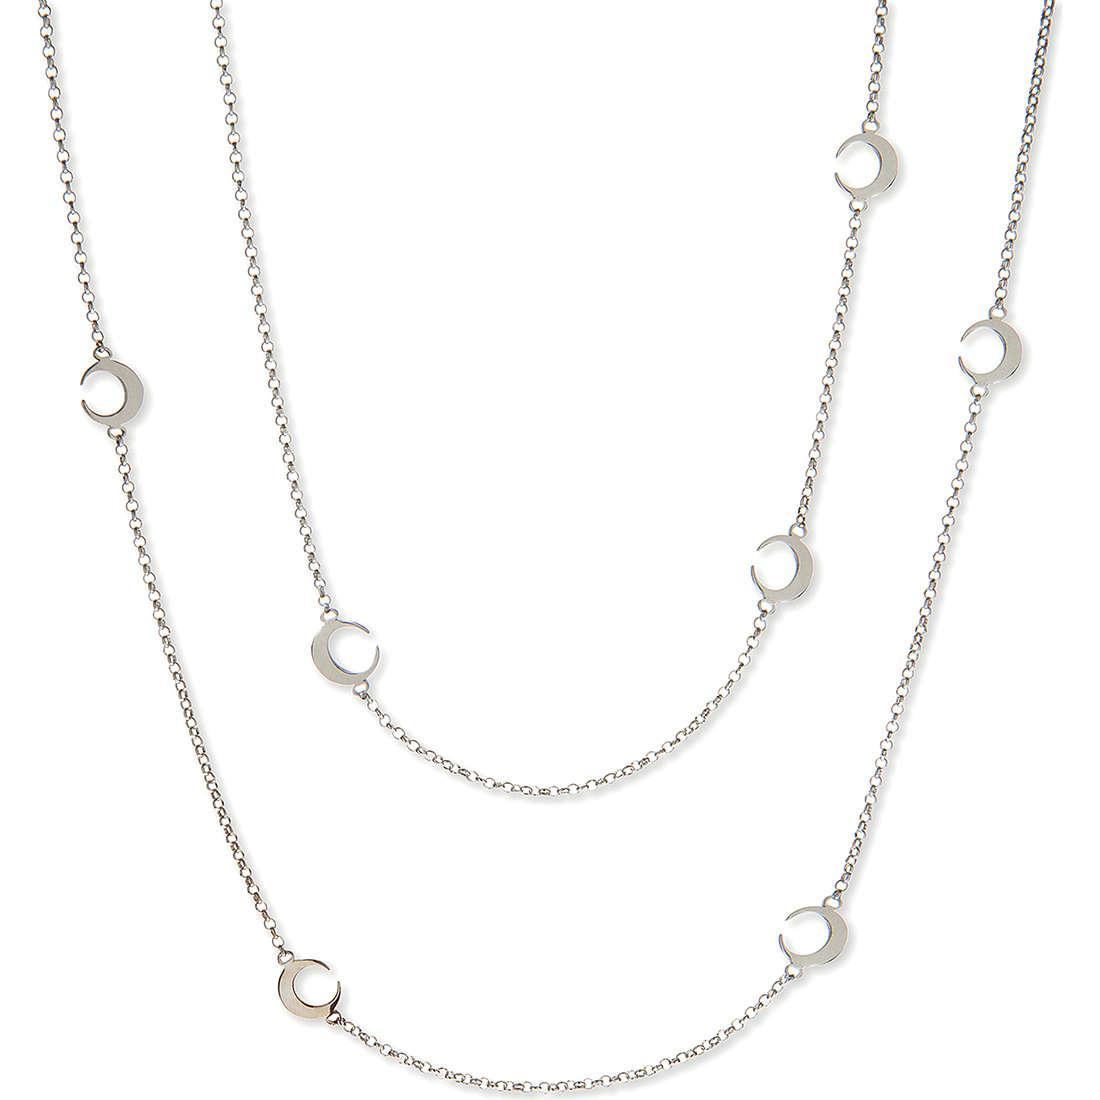 Collana donna gioielli jackco jcn0218